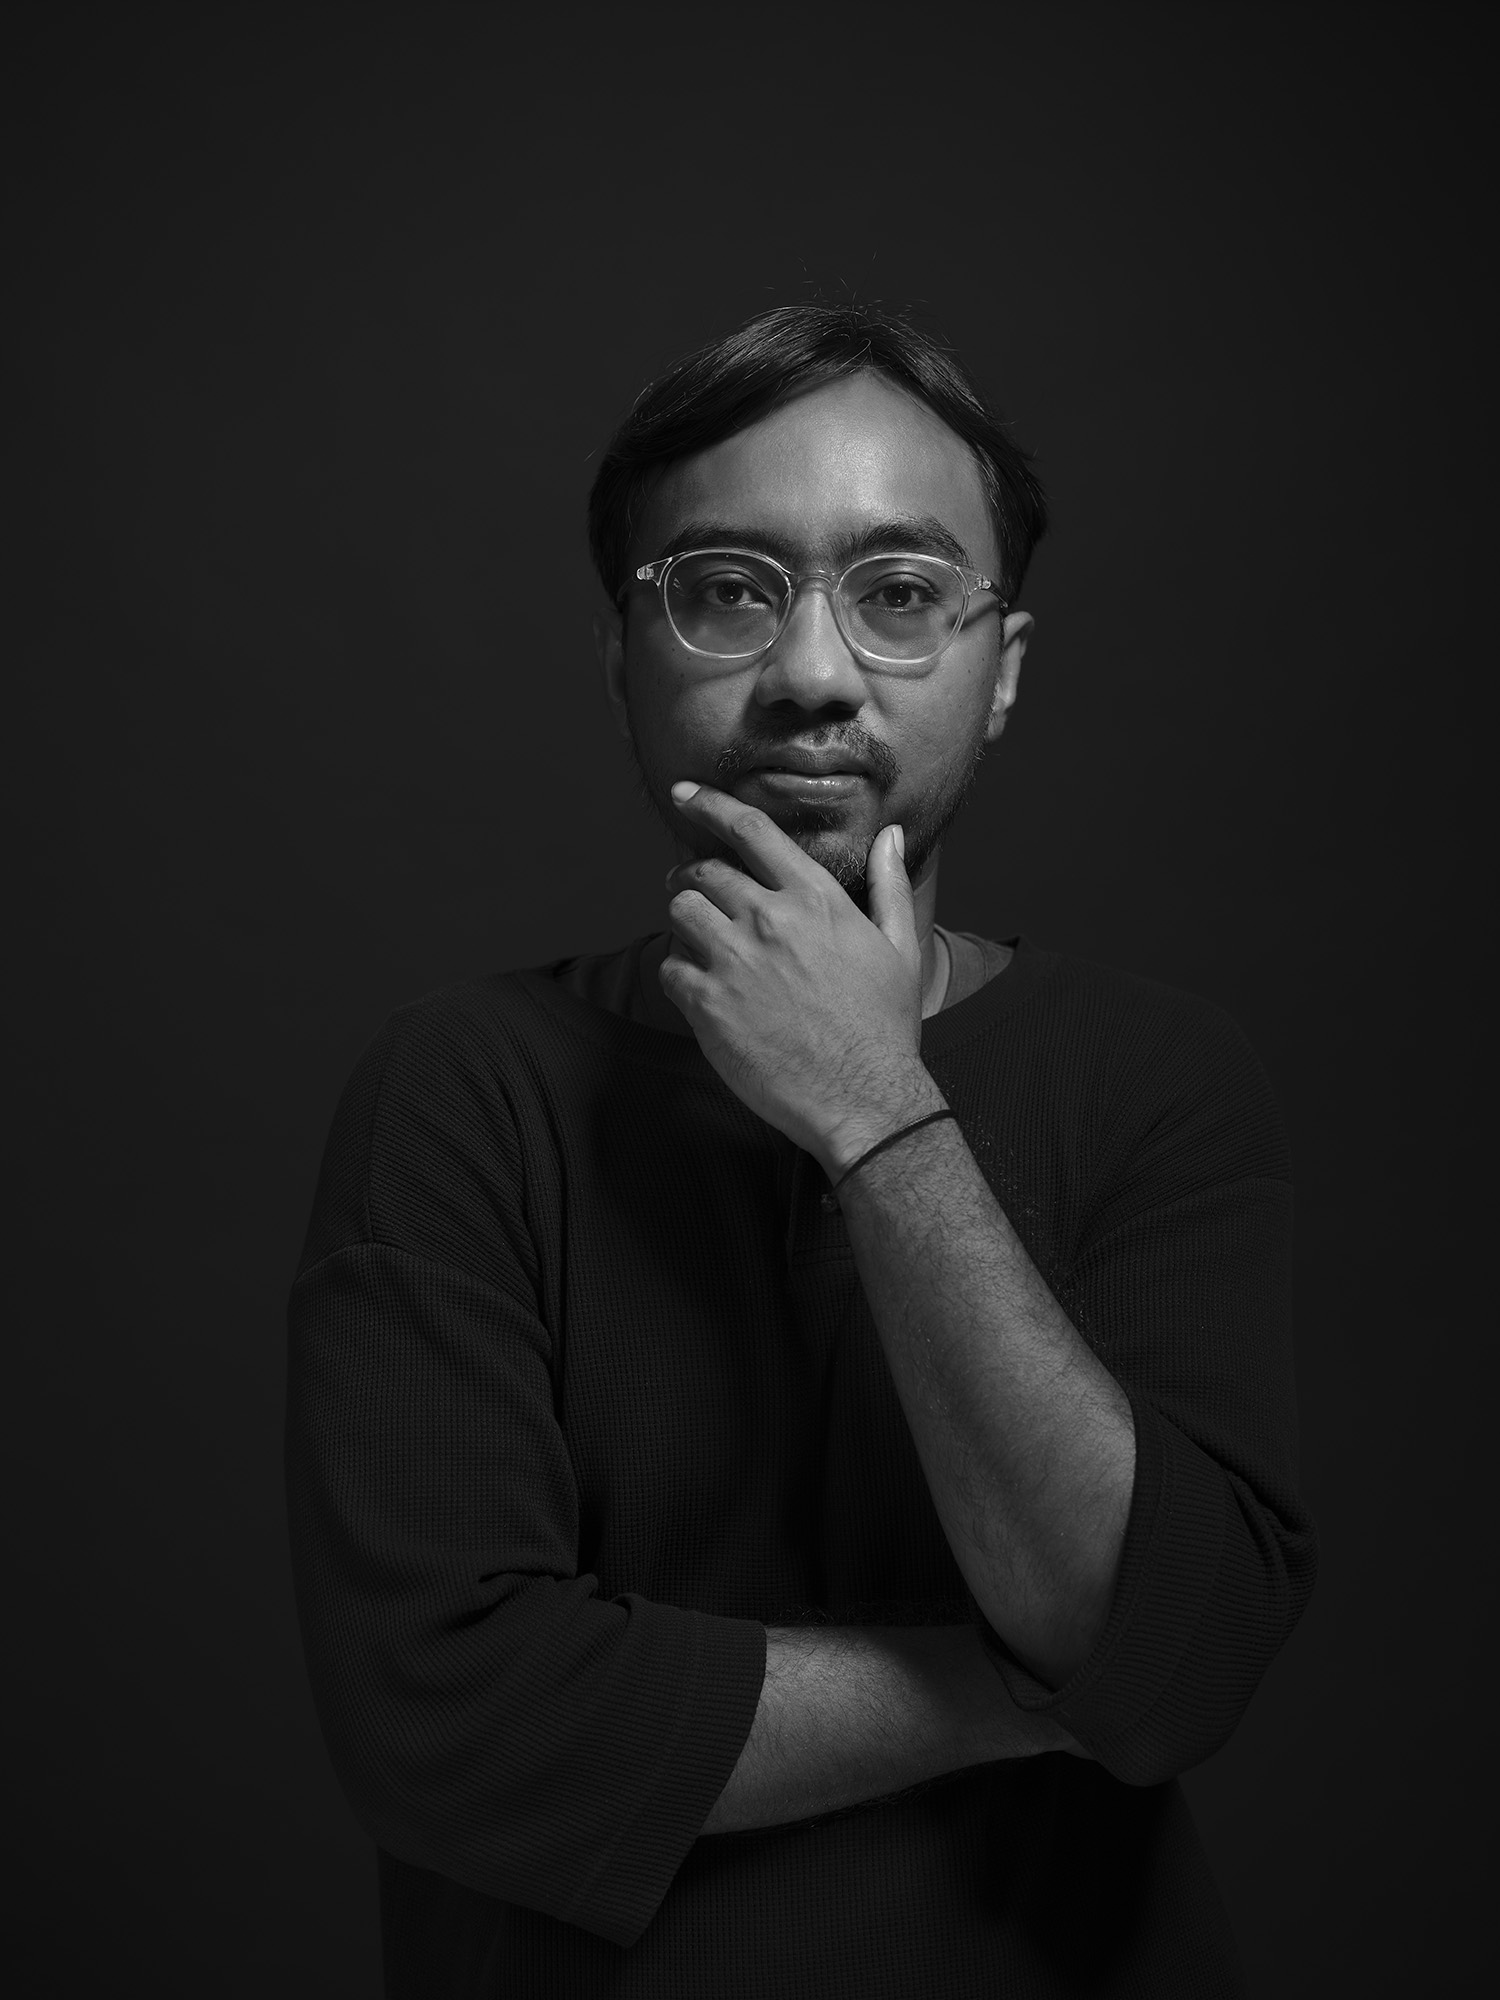 Ramboll Black and White Photography Portrait Photographer Singapore COCO Creative Studio 45